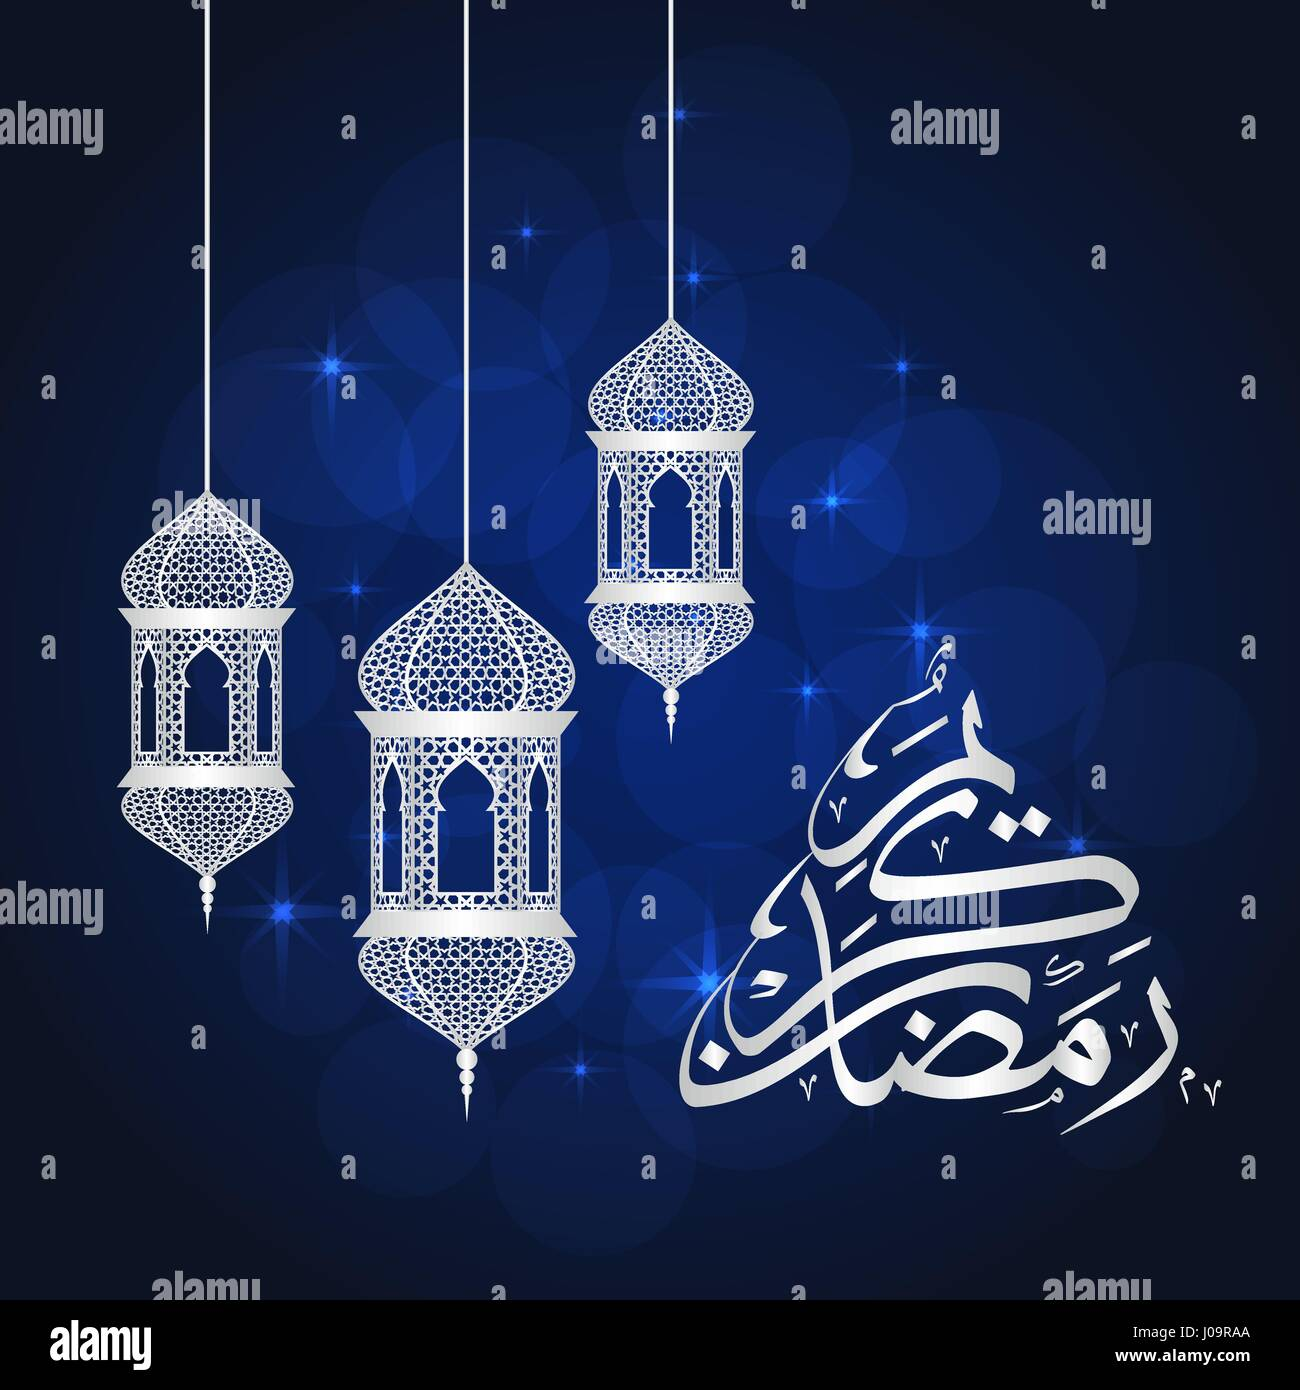 Ramadan greeting card on blue background vector illustration stock ramadan greeting card on blue background vector illustration ramadan kareem means ramadan is generous kristyandbryce Image collections